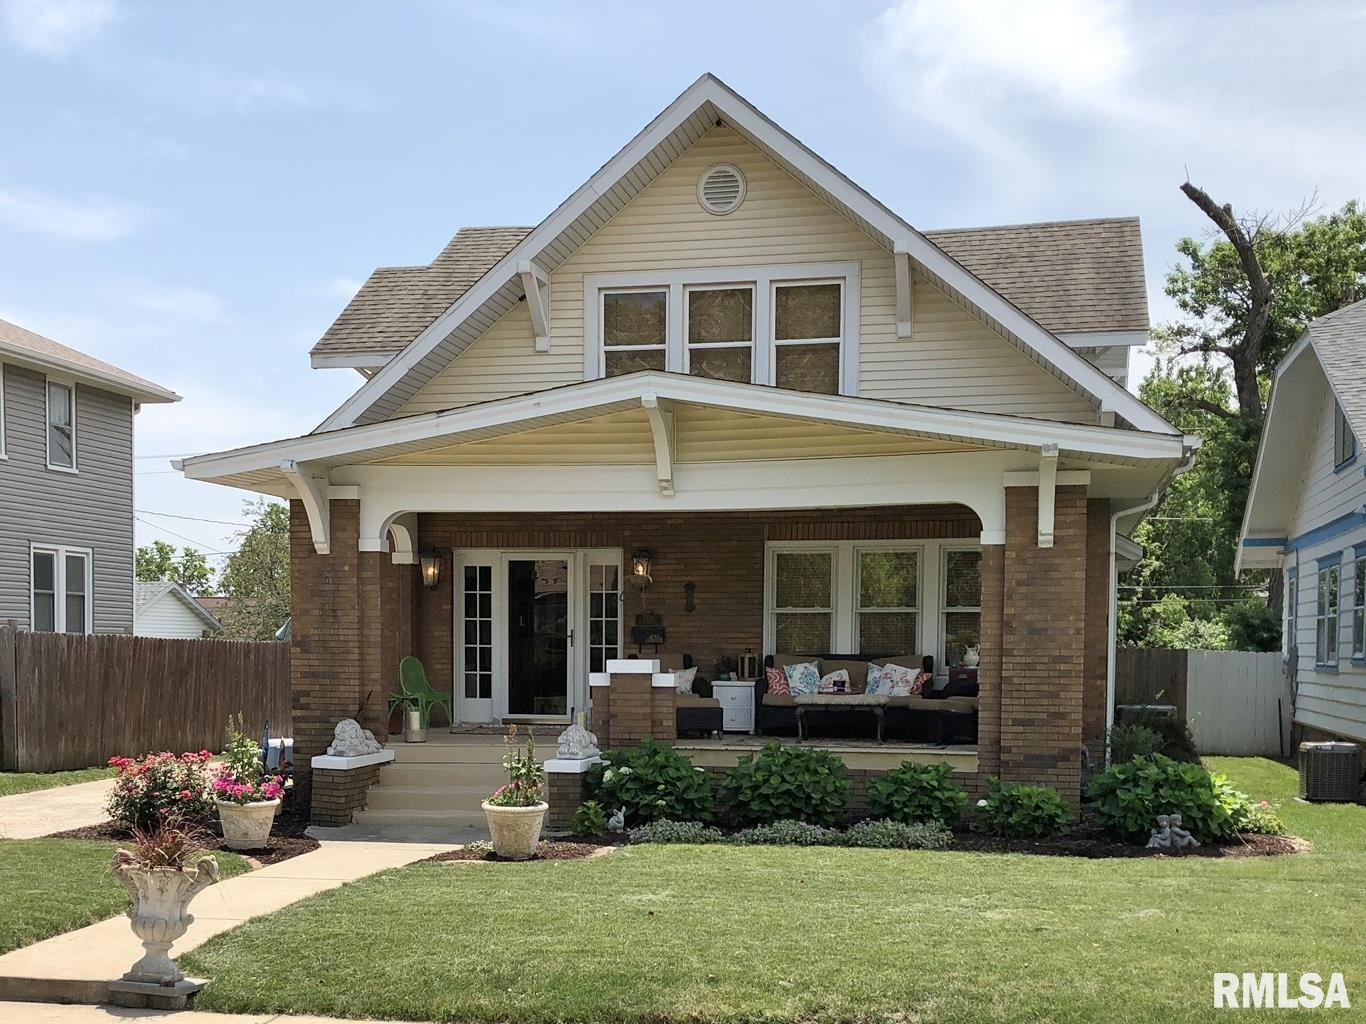 1318 E HILLCREST Property Photo - Peoria, IL real estate listing